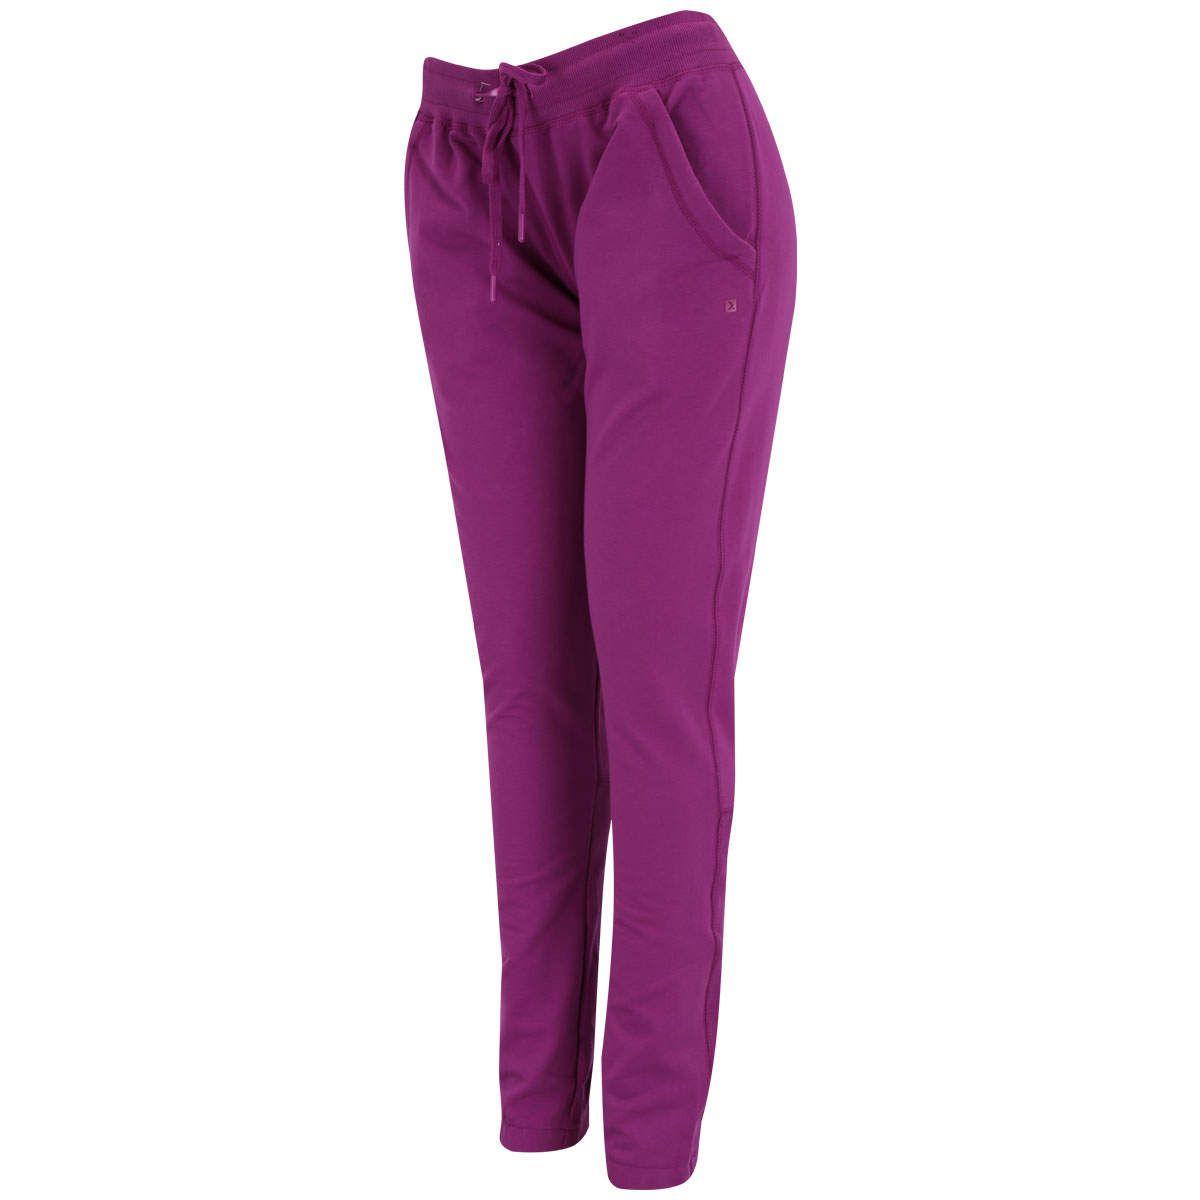 Calça Oxer Dance - Feminina   Pants, shorts   cia   Shorts, Pants e ... 805df072f3